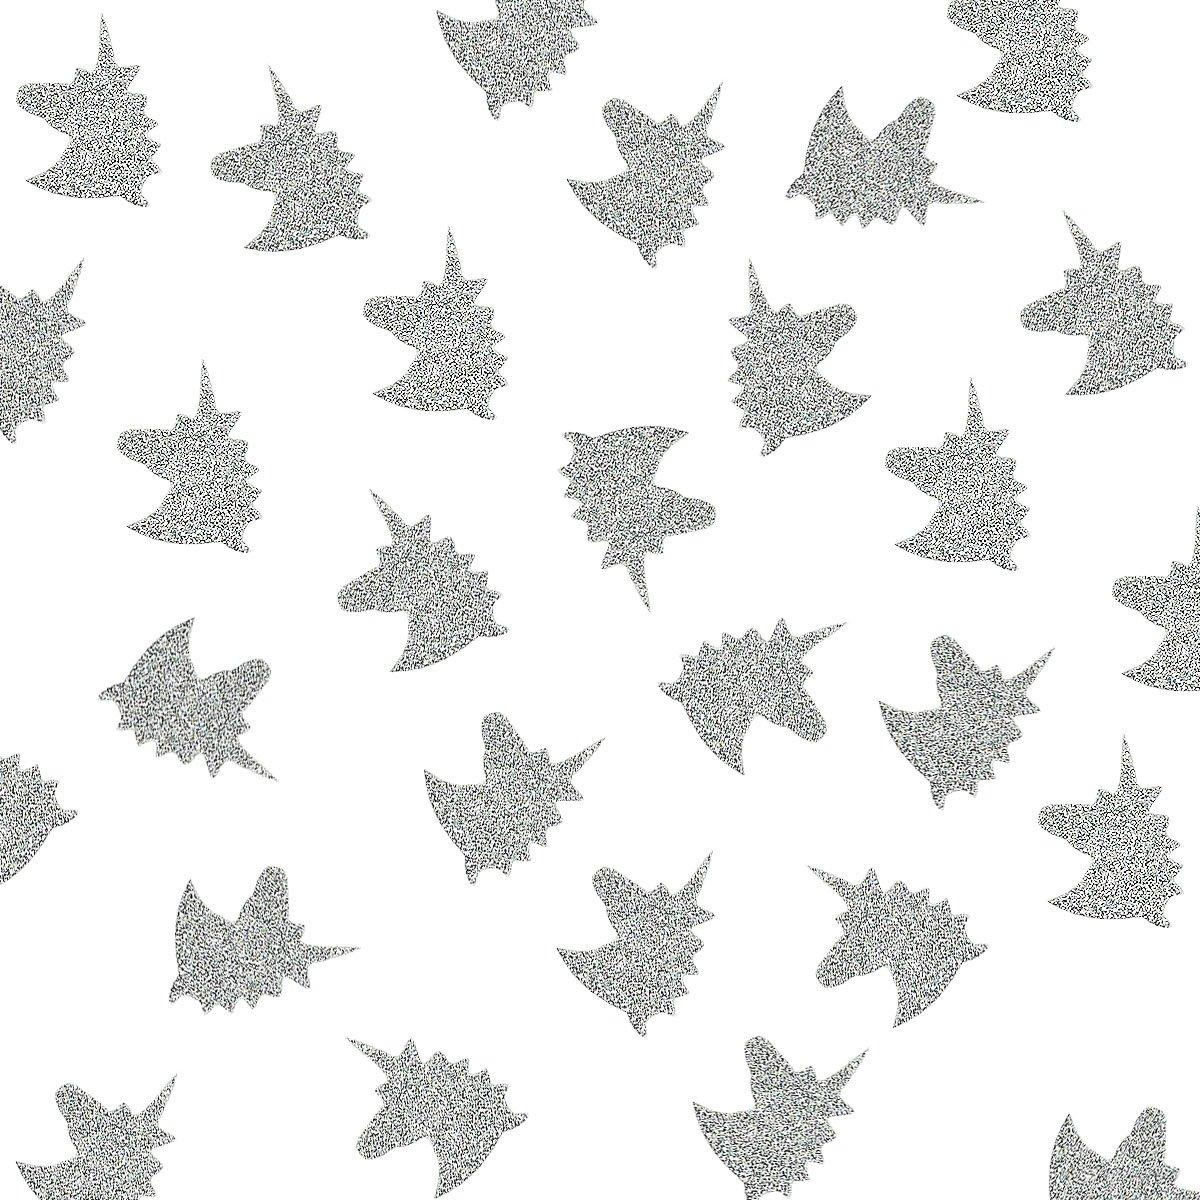 NICROLANDEE Unicorn Wedding Confetti Silver Glitter Paper Party Confetti Table Scatter Decor Unicorn Party Supplies Bachelorette Bridal Shower Birthday Baby Shower Favor 50g/Pack